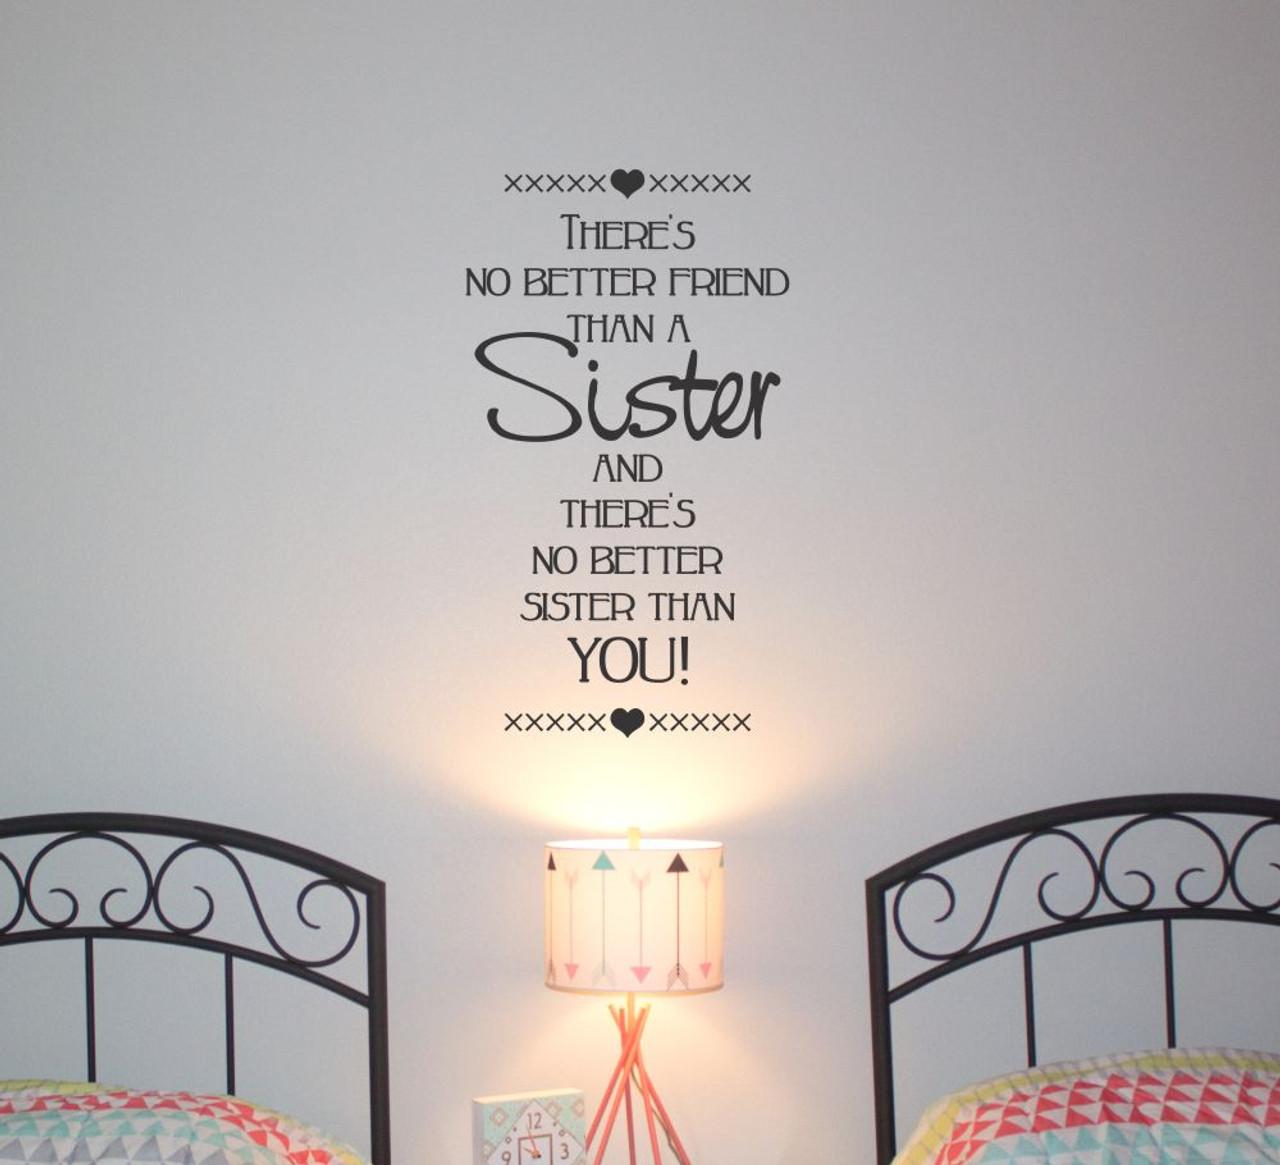 Sisters make the best of friends girls bedroom home wall art sticker nursery diy